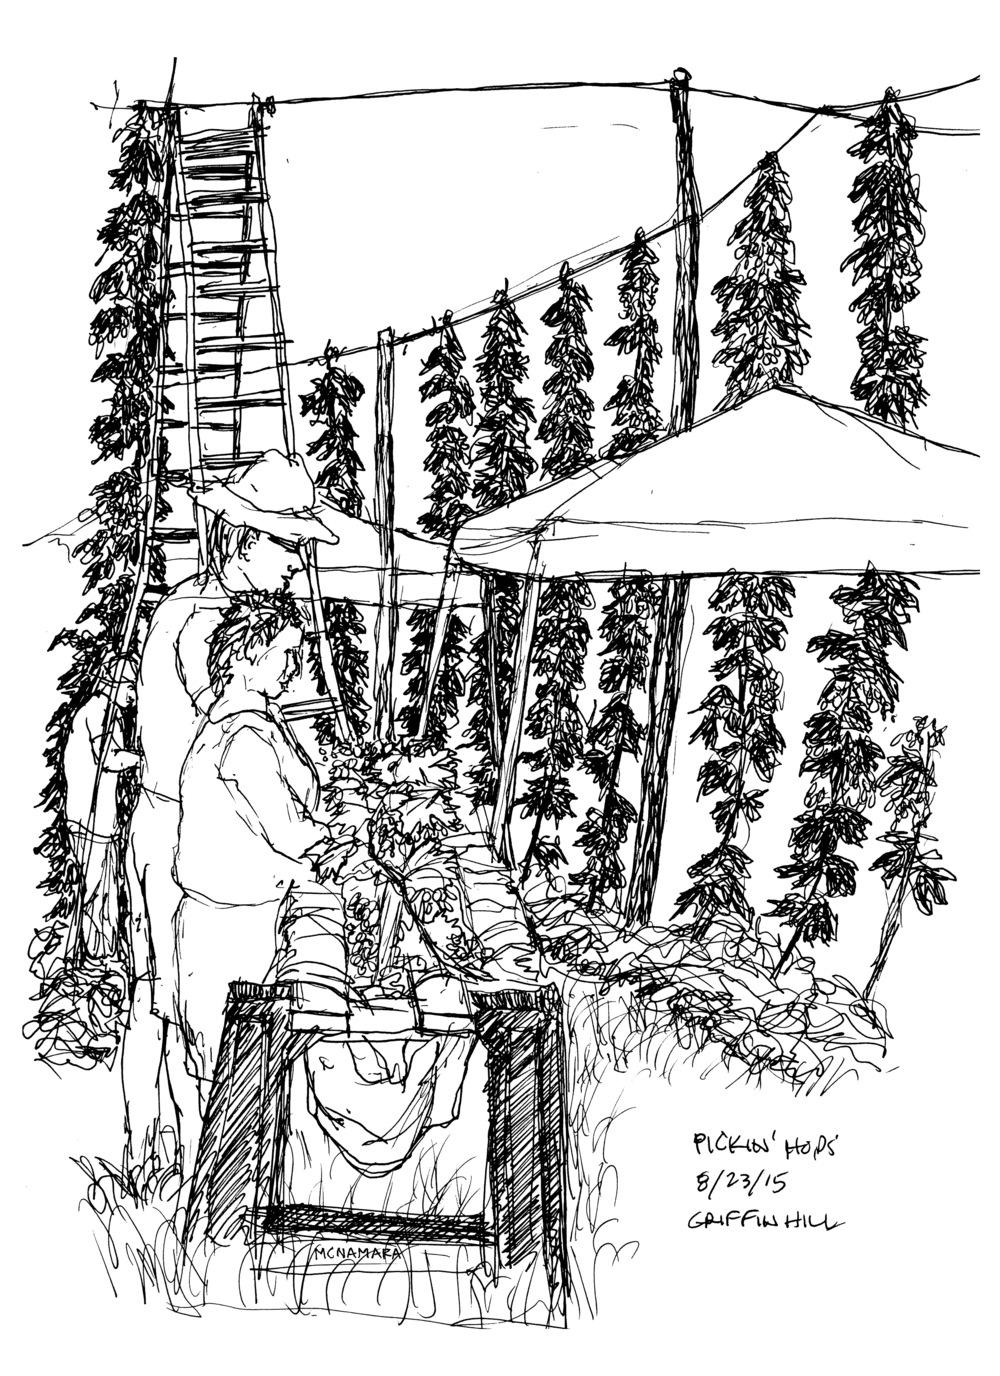 Drawing courtesy of master picker Bob McNamara